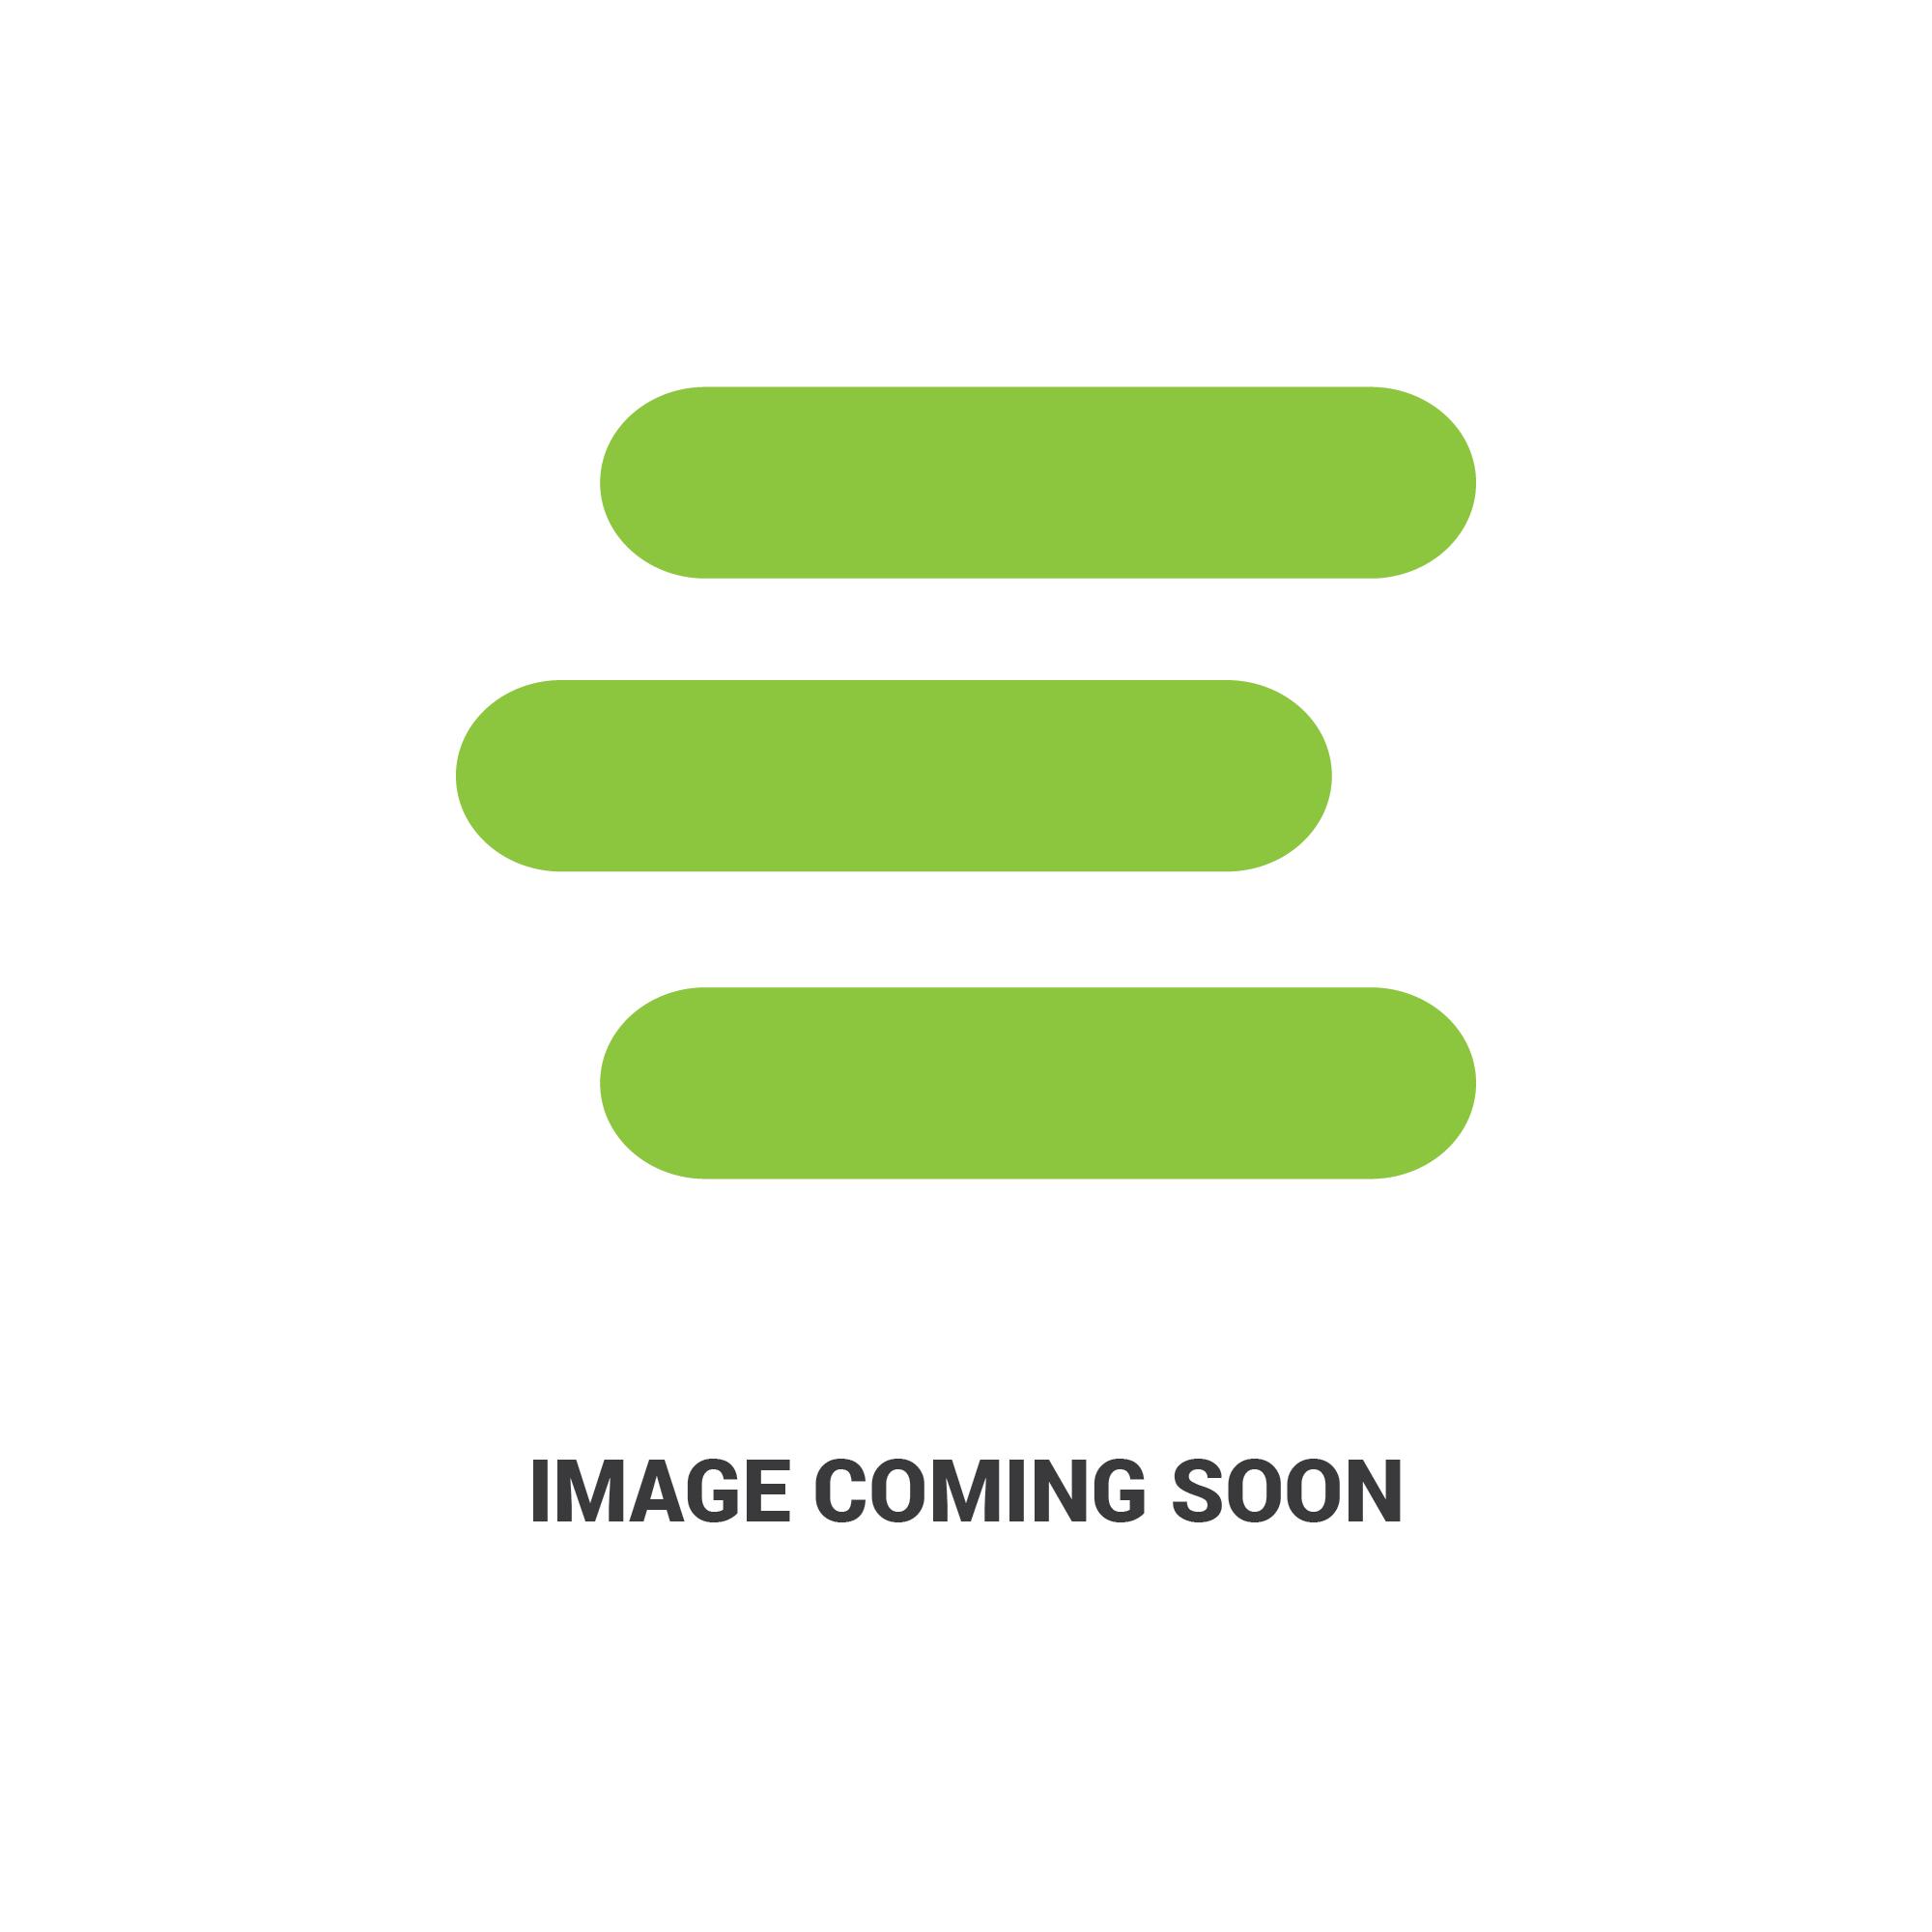 E-7008312edit 1.jpg